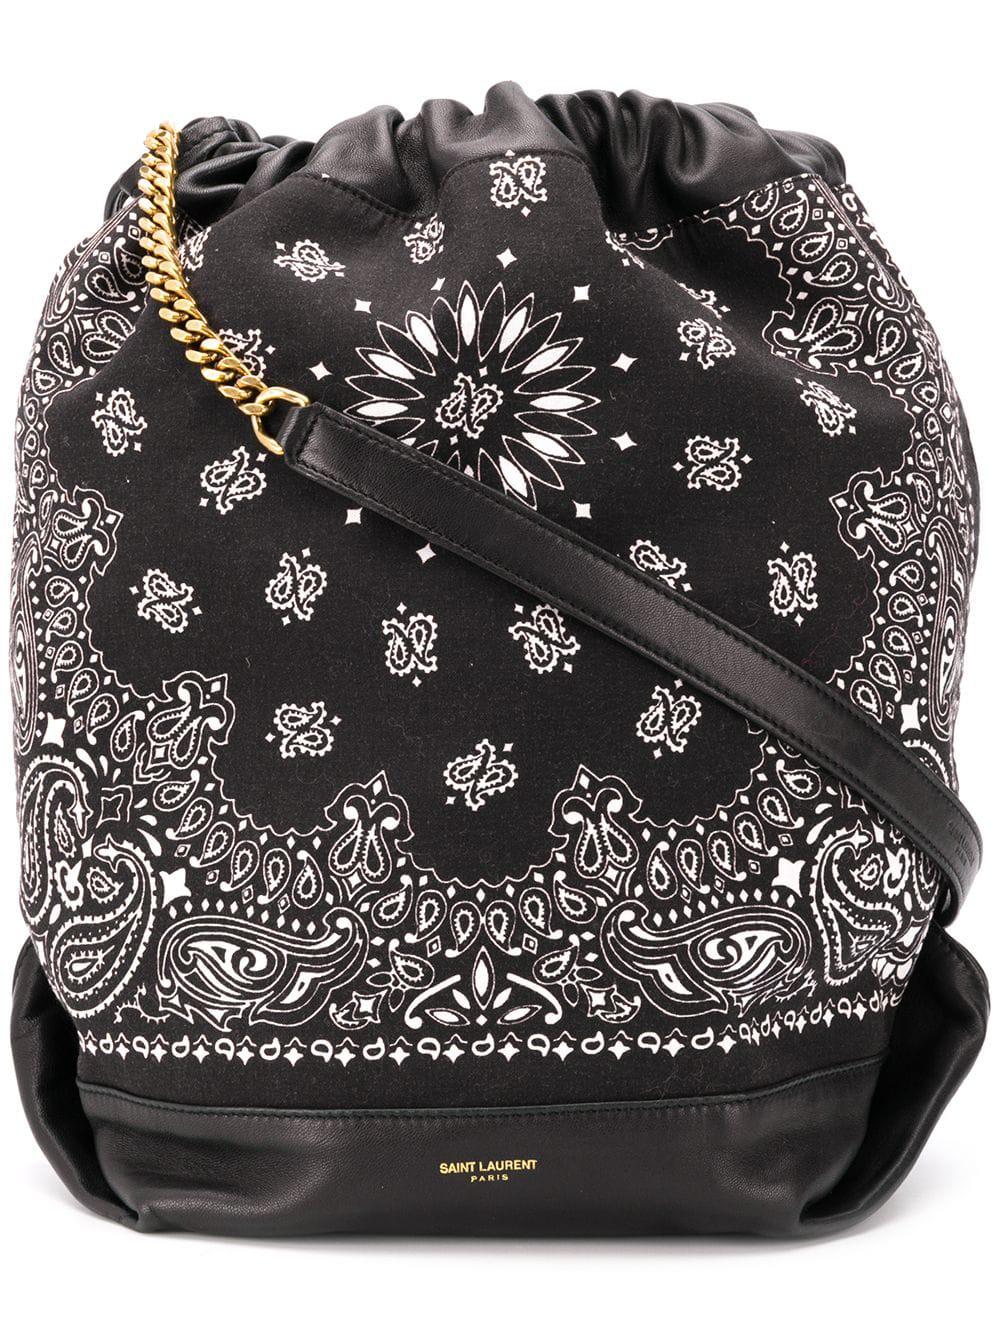 a363b23f80b Saint Laurent Teddy Bandana Bucket Bag - Black | ModeSens